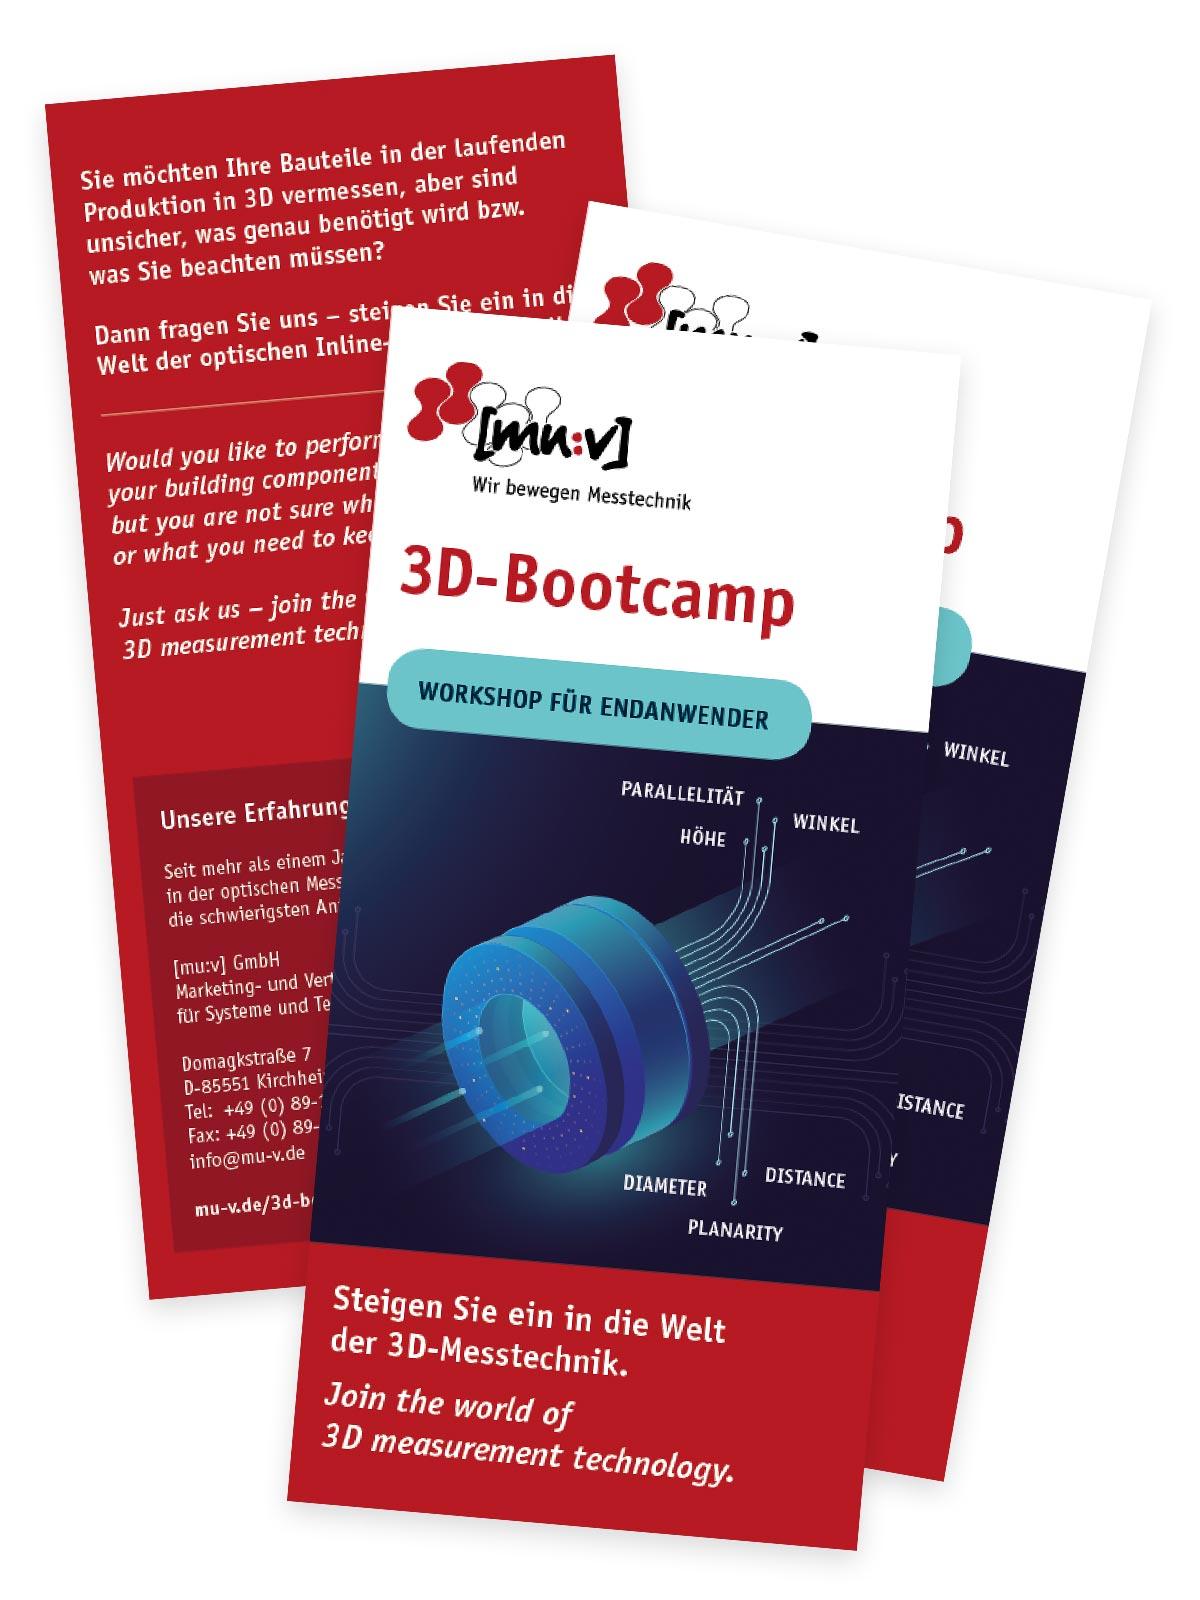 [mu:v] Messtechnik: Faltblatt Workshop 3D-Bootcamp